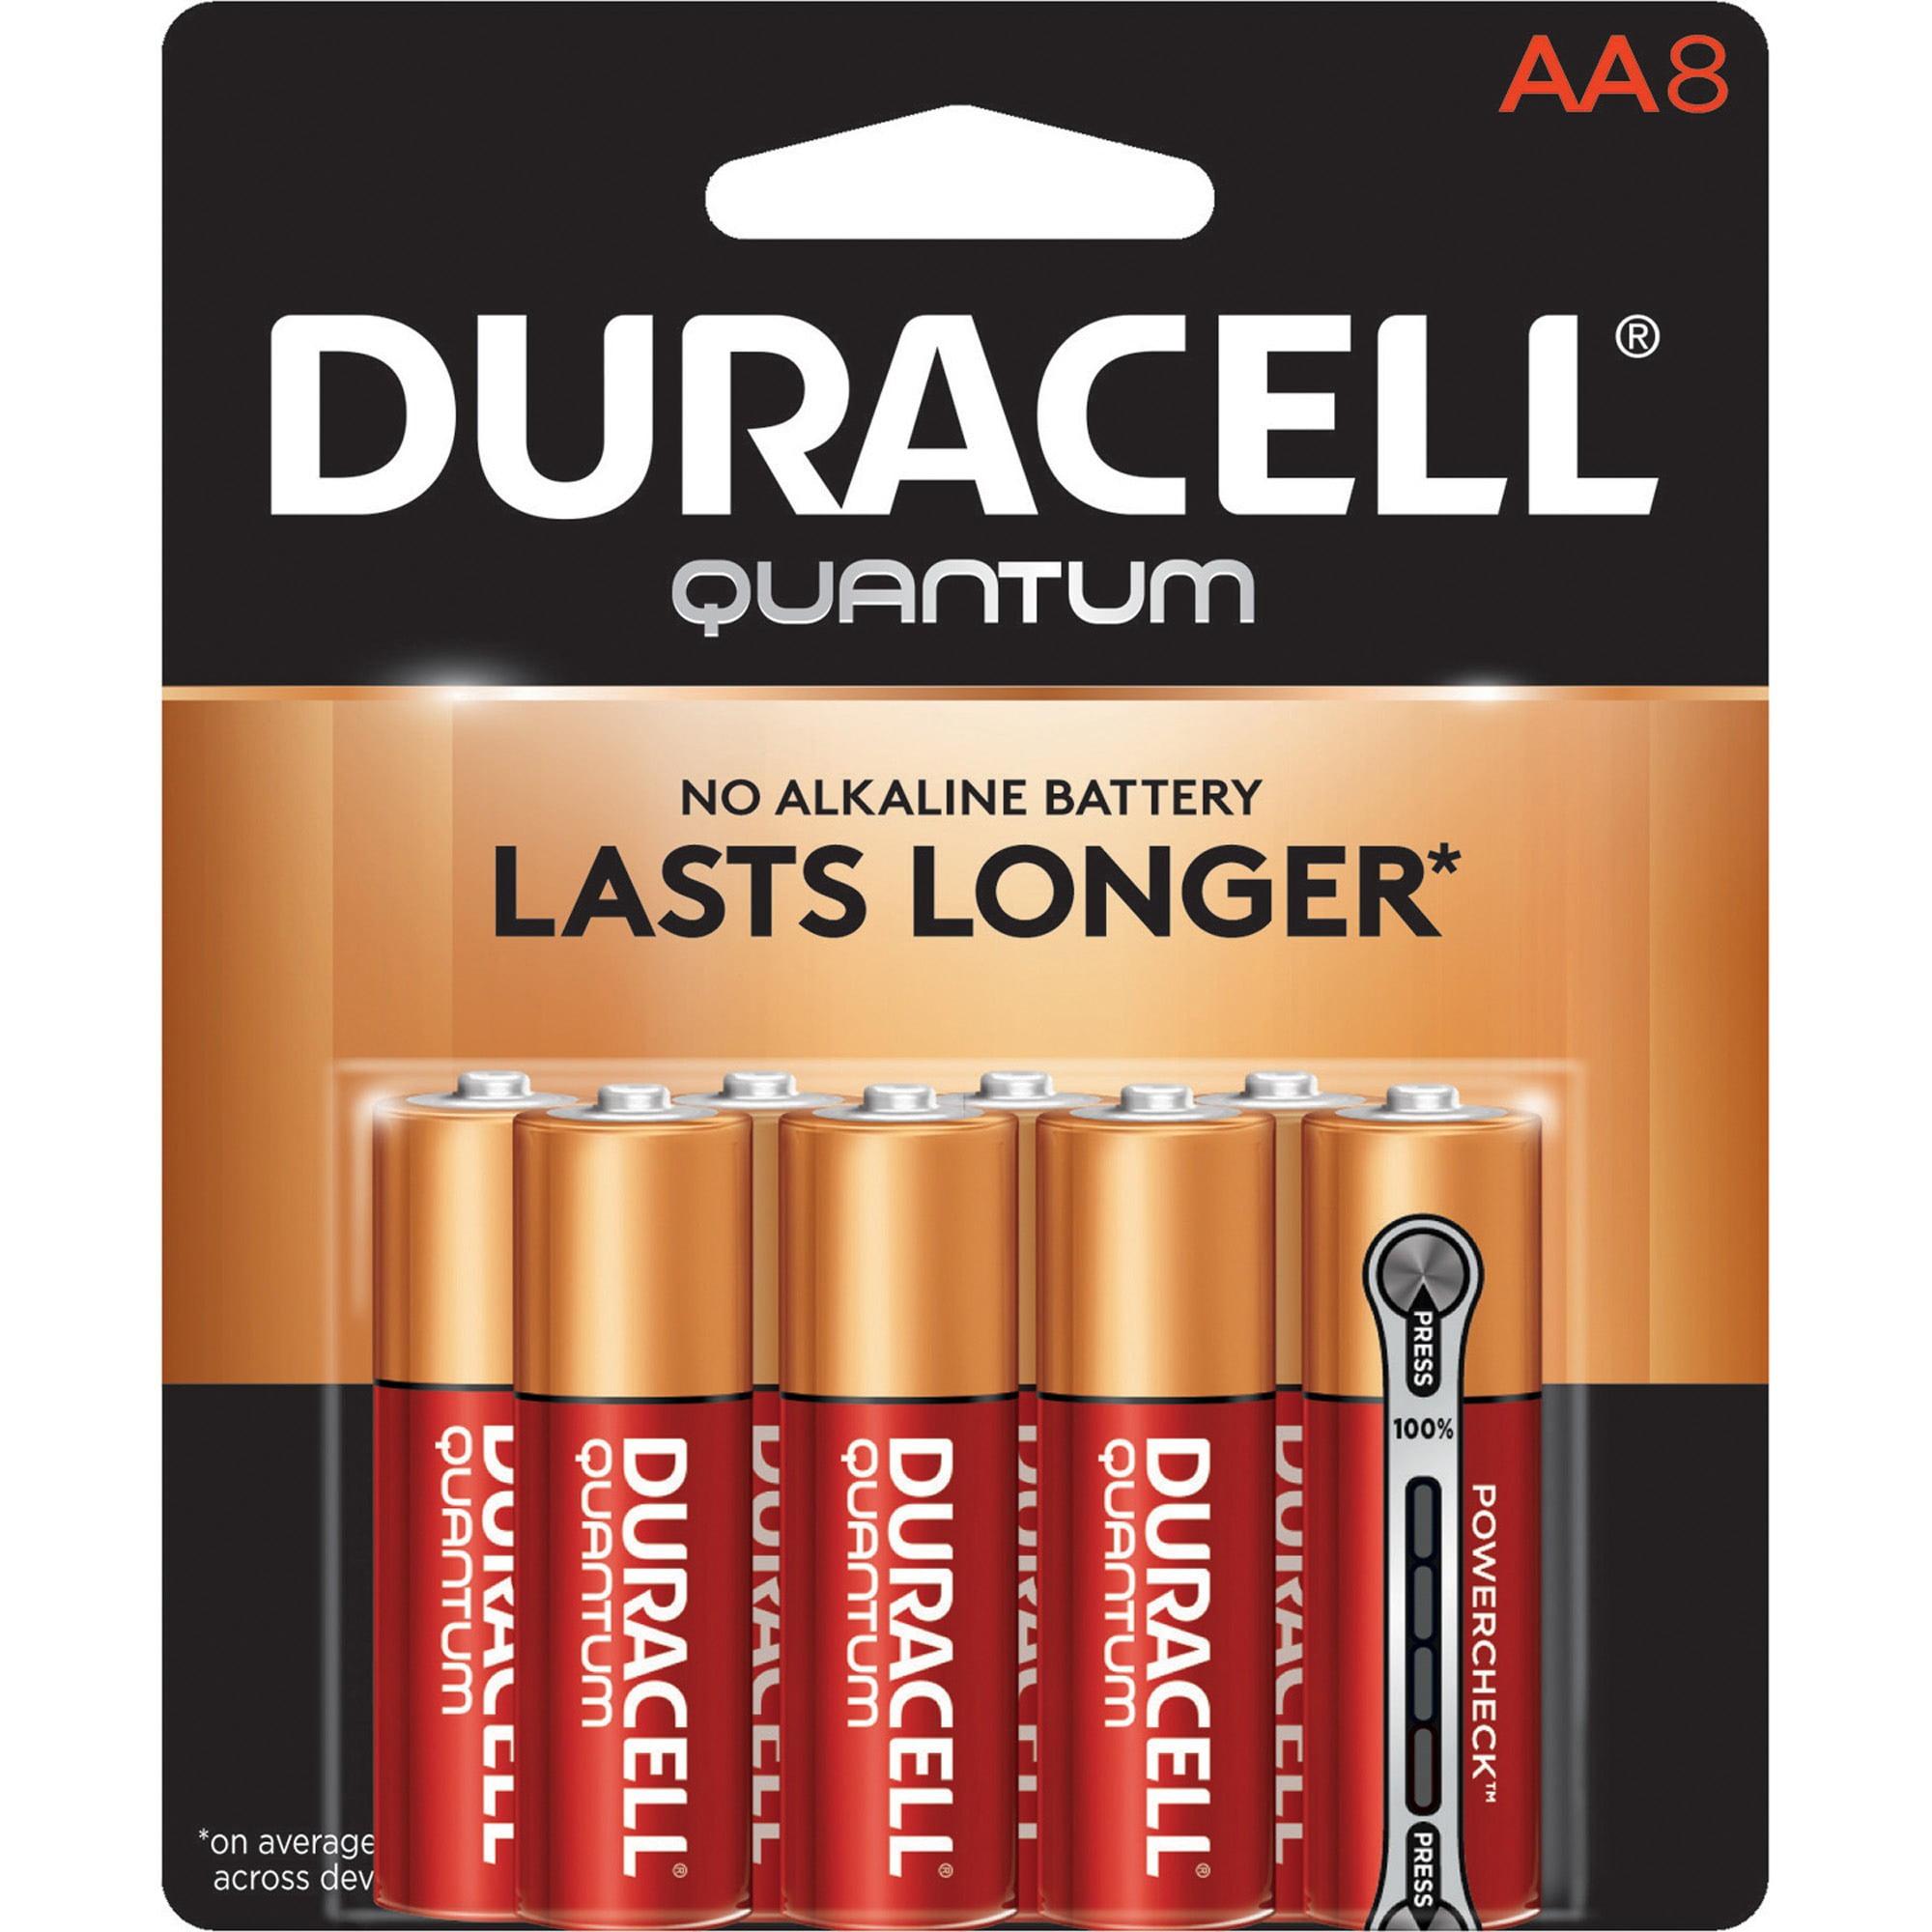 Duracell Quantum Alkaline AA Batteries, 8 Count